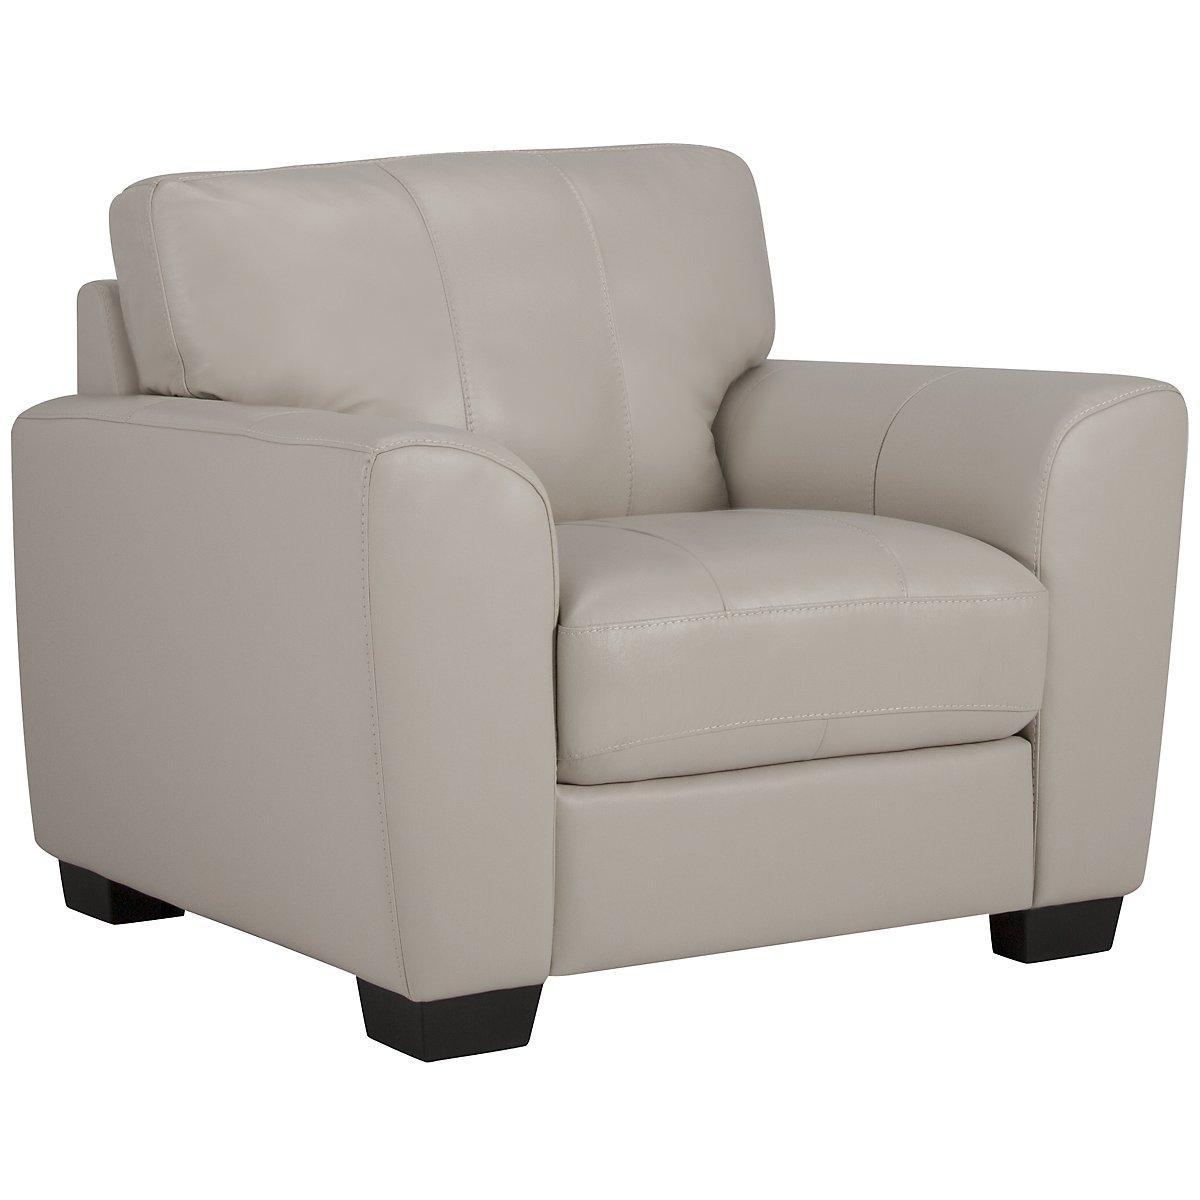 Fallon Light Gray Leather & Vinyl Chair